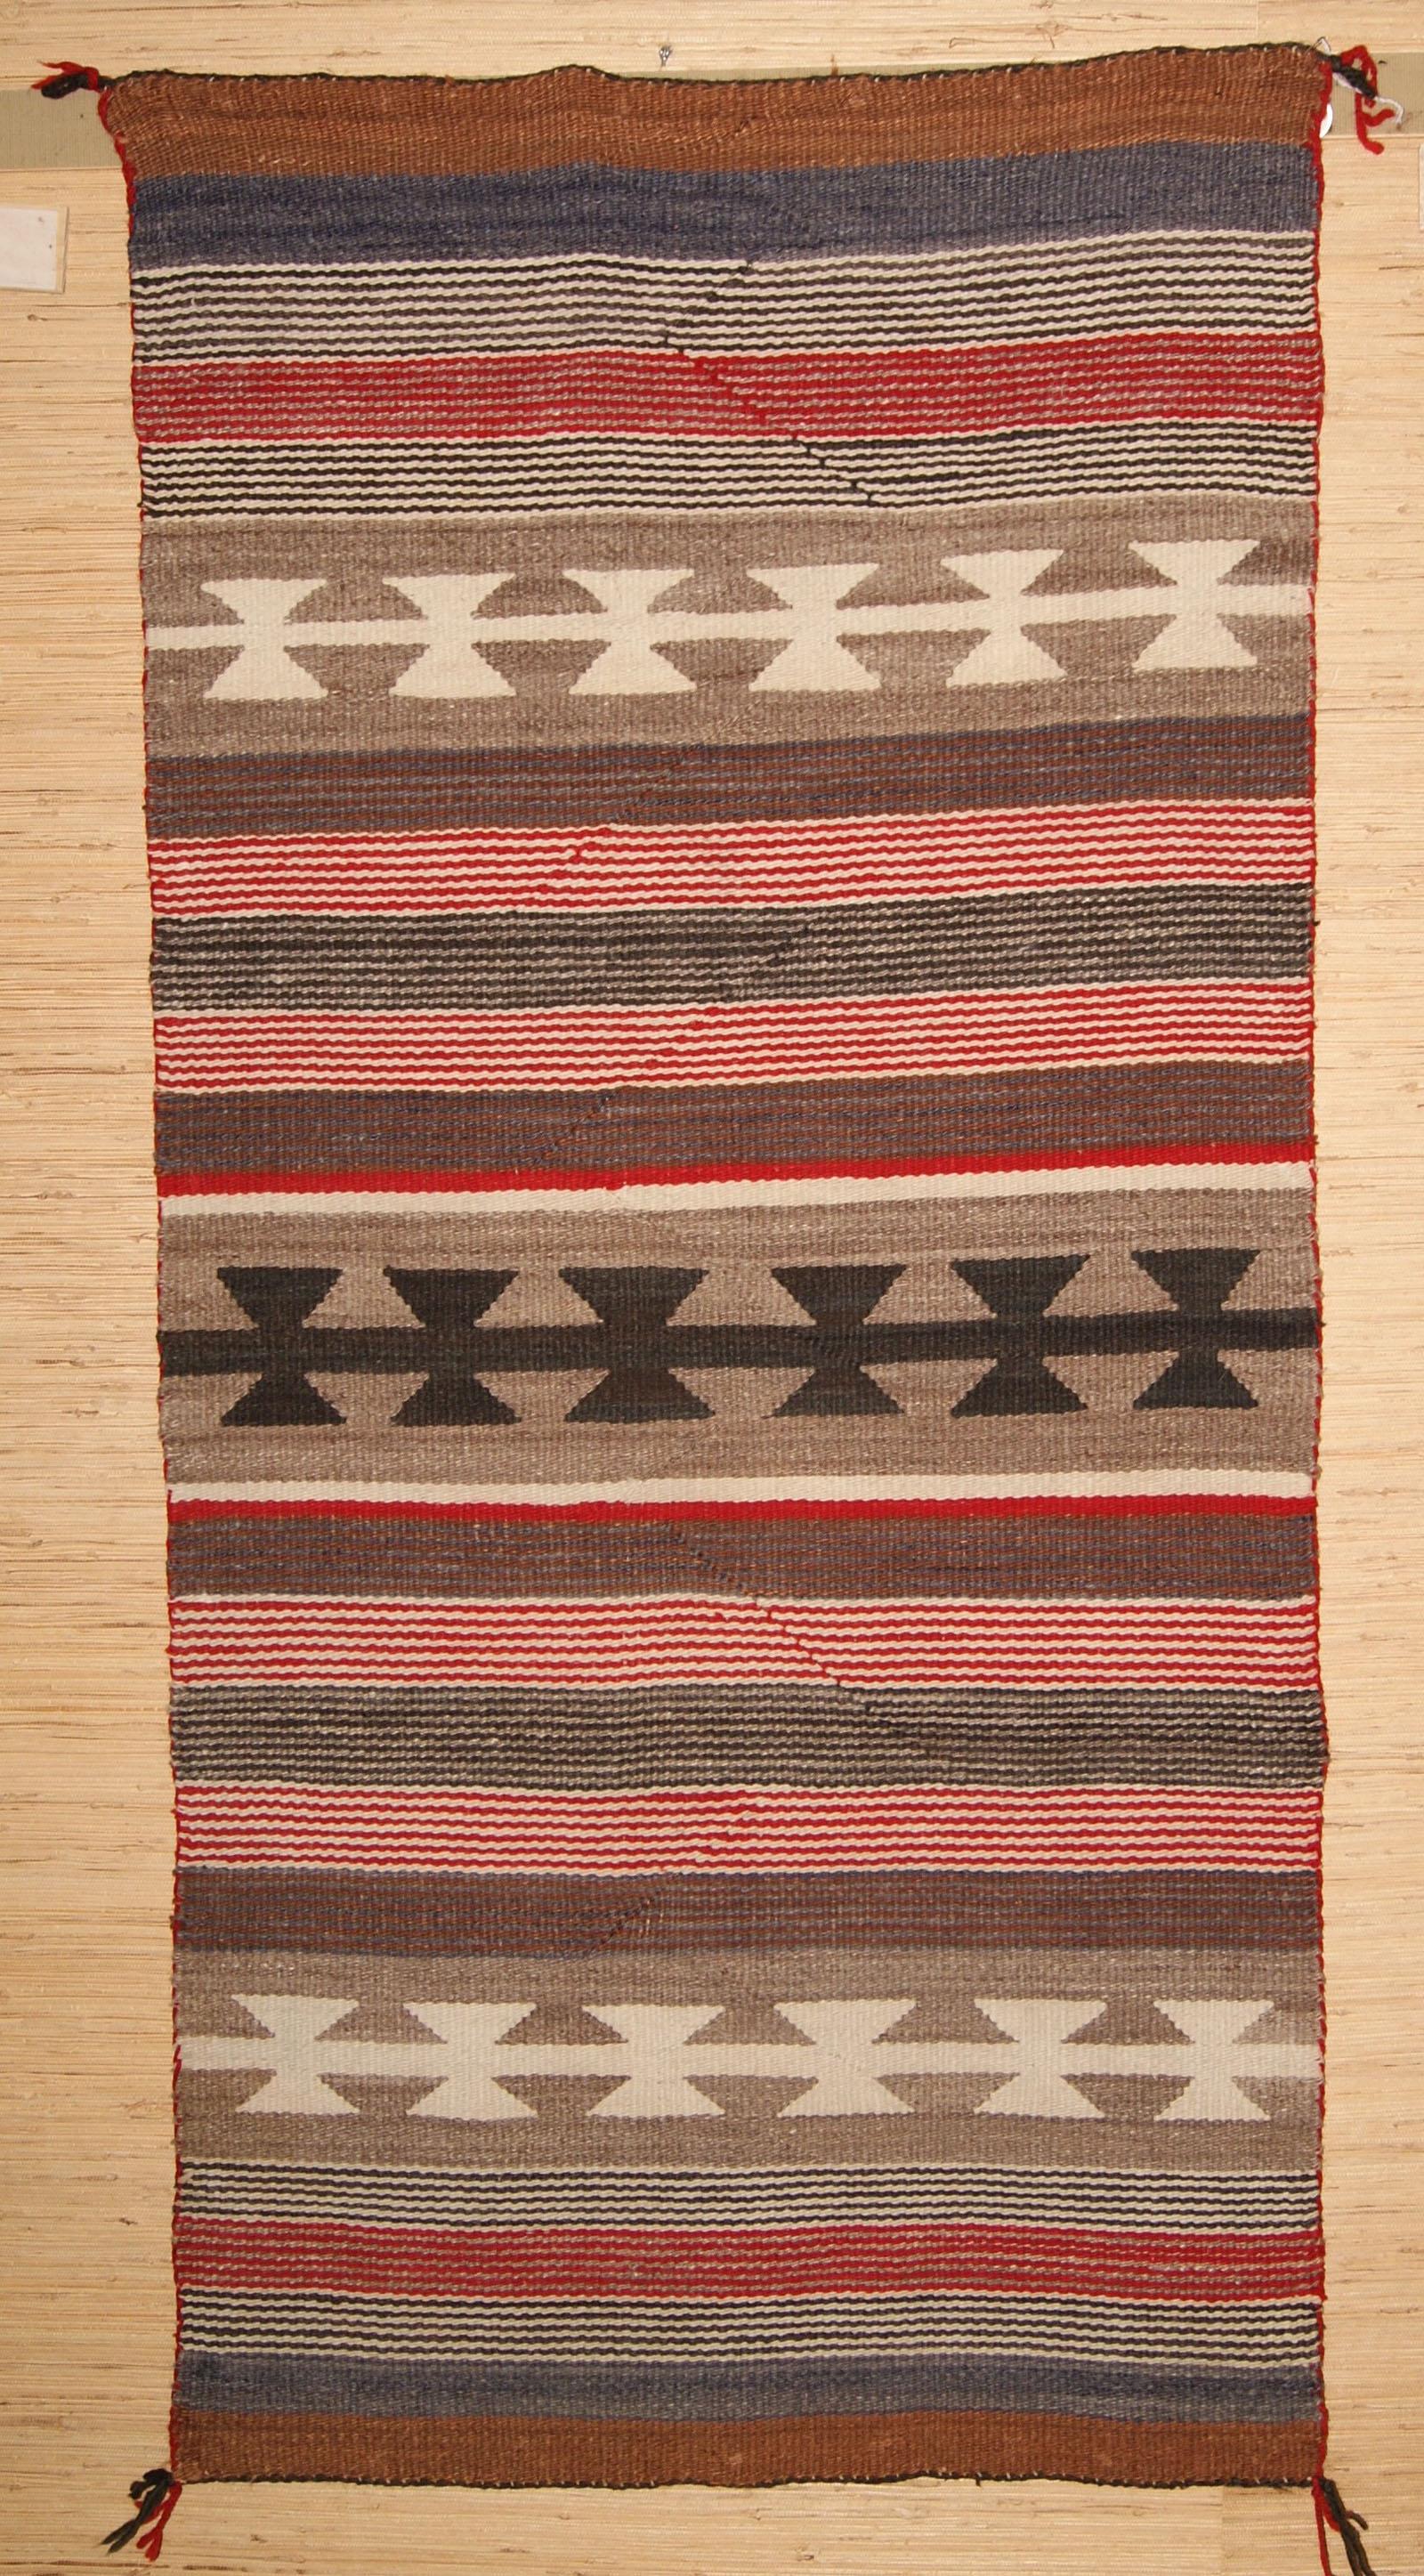 Saddle Blanket From The Lukachukai Area